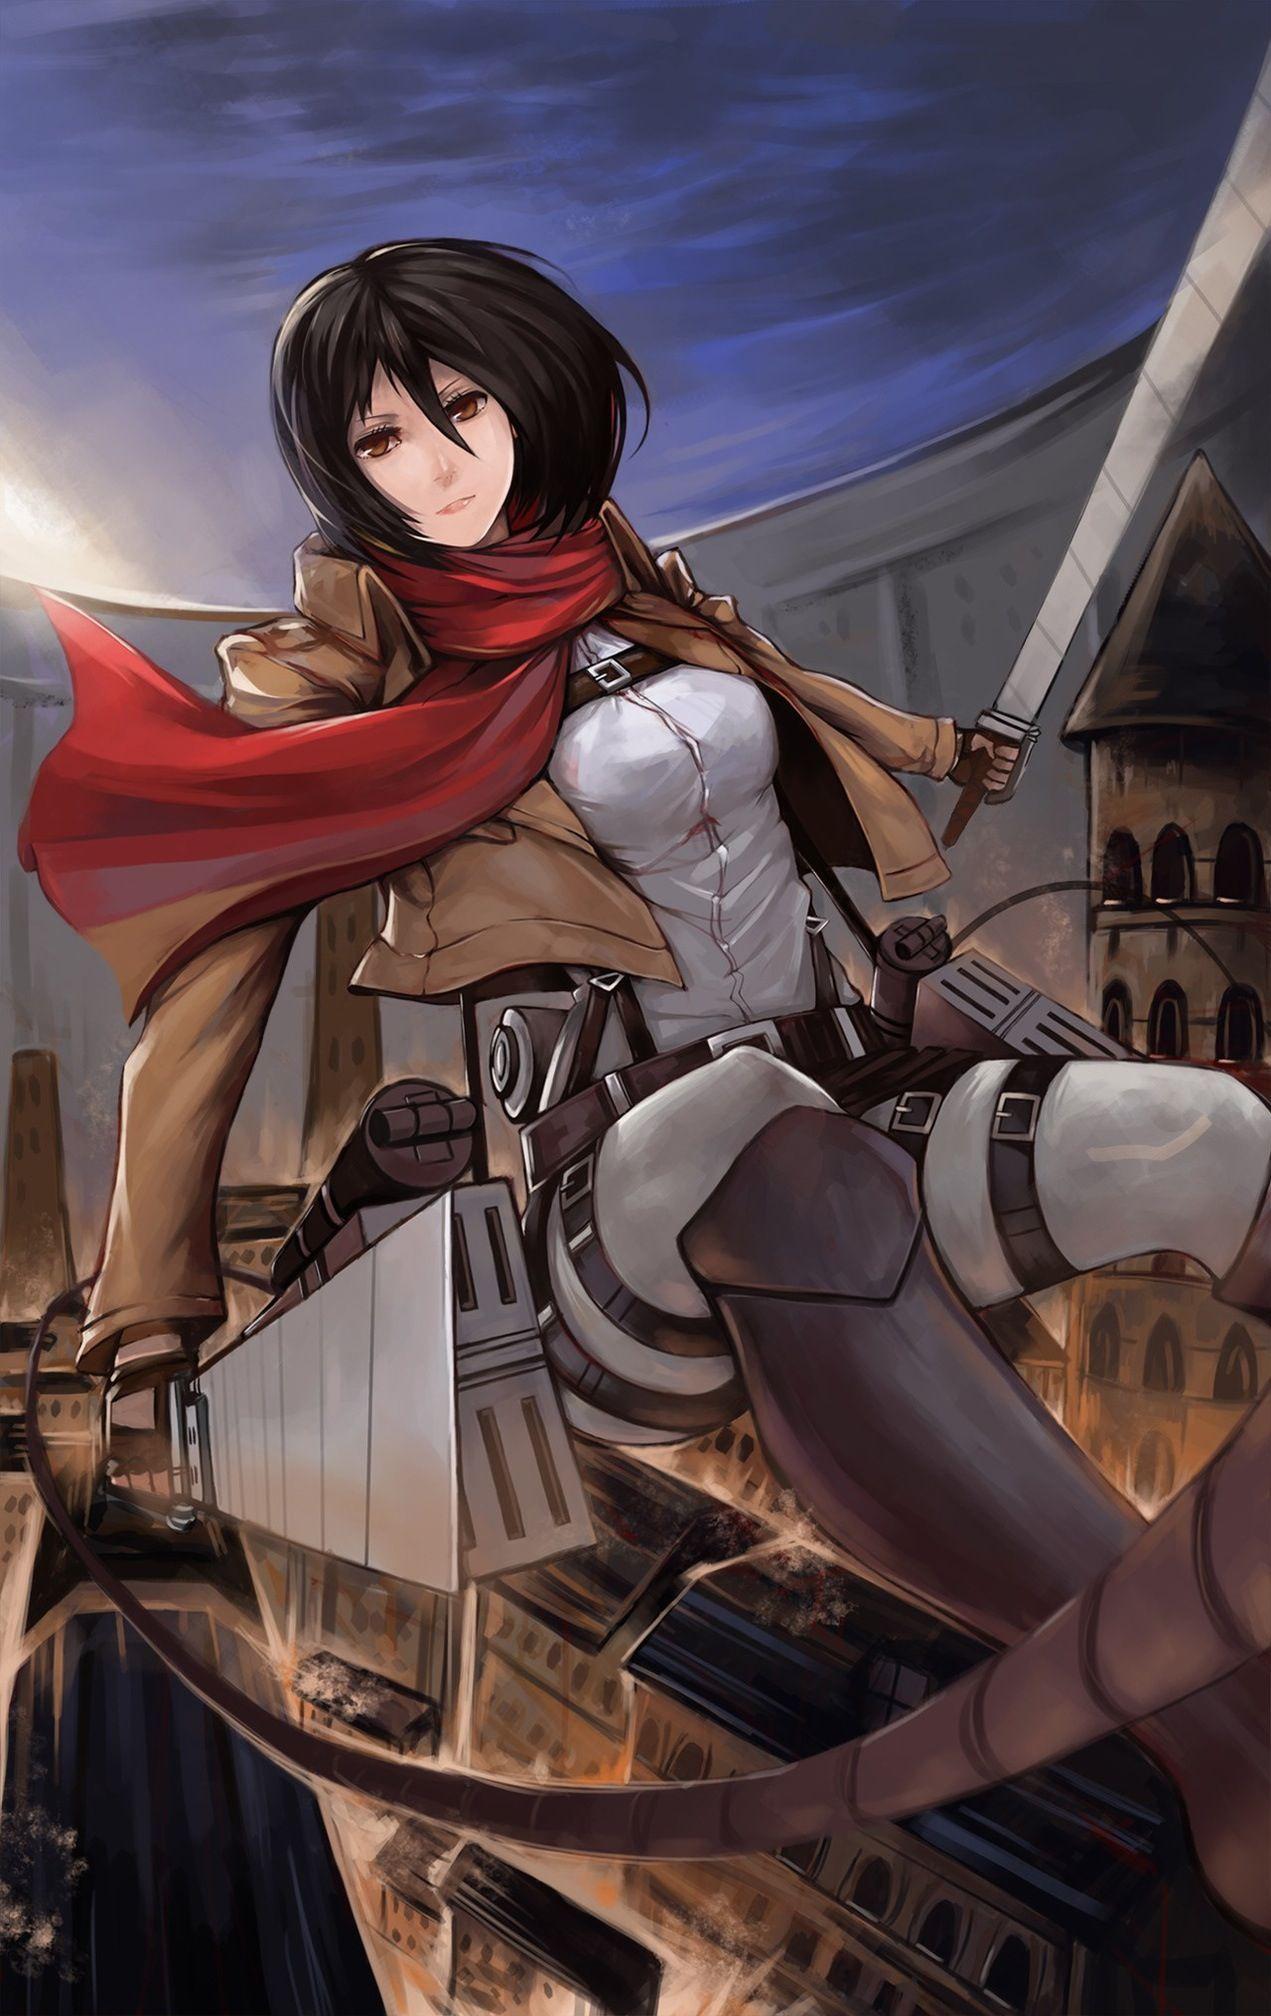 Attack on Titan Attack on titan, Anime